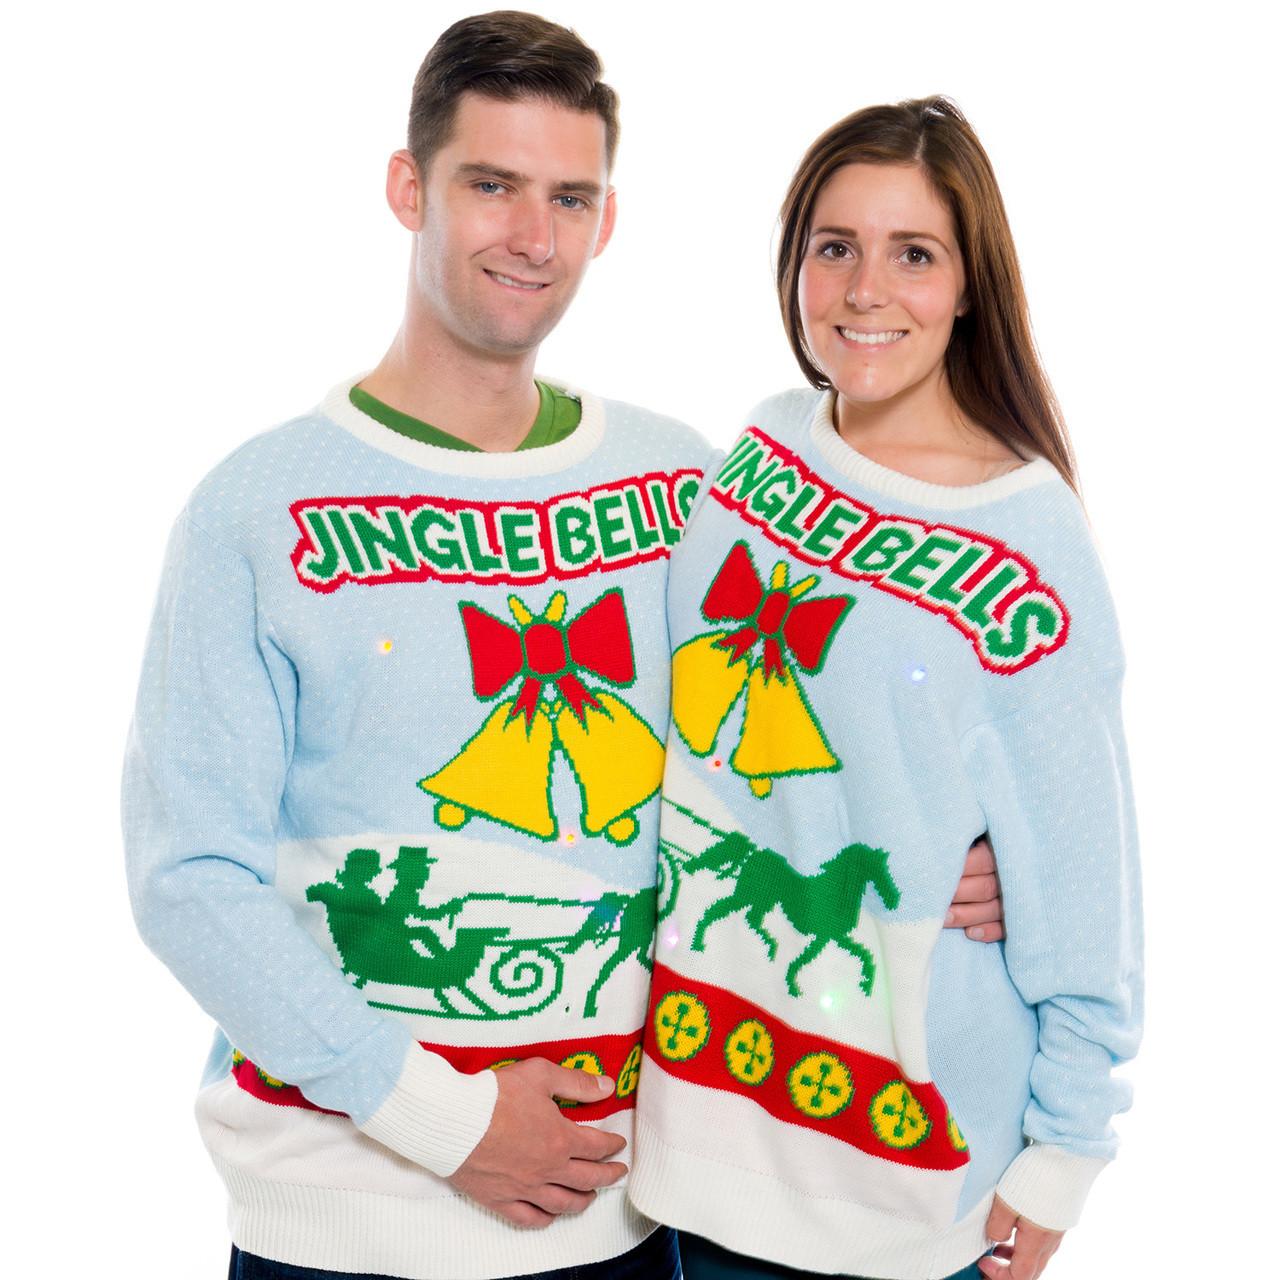 74bafdf43c2 Jingle Bells Lights and Sound Christmas Sweater I RetroFestive.ca